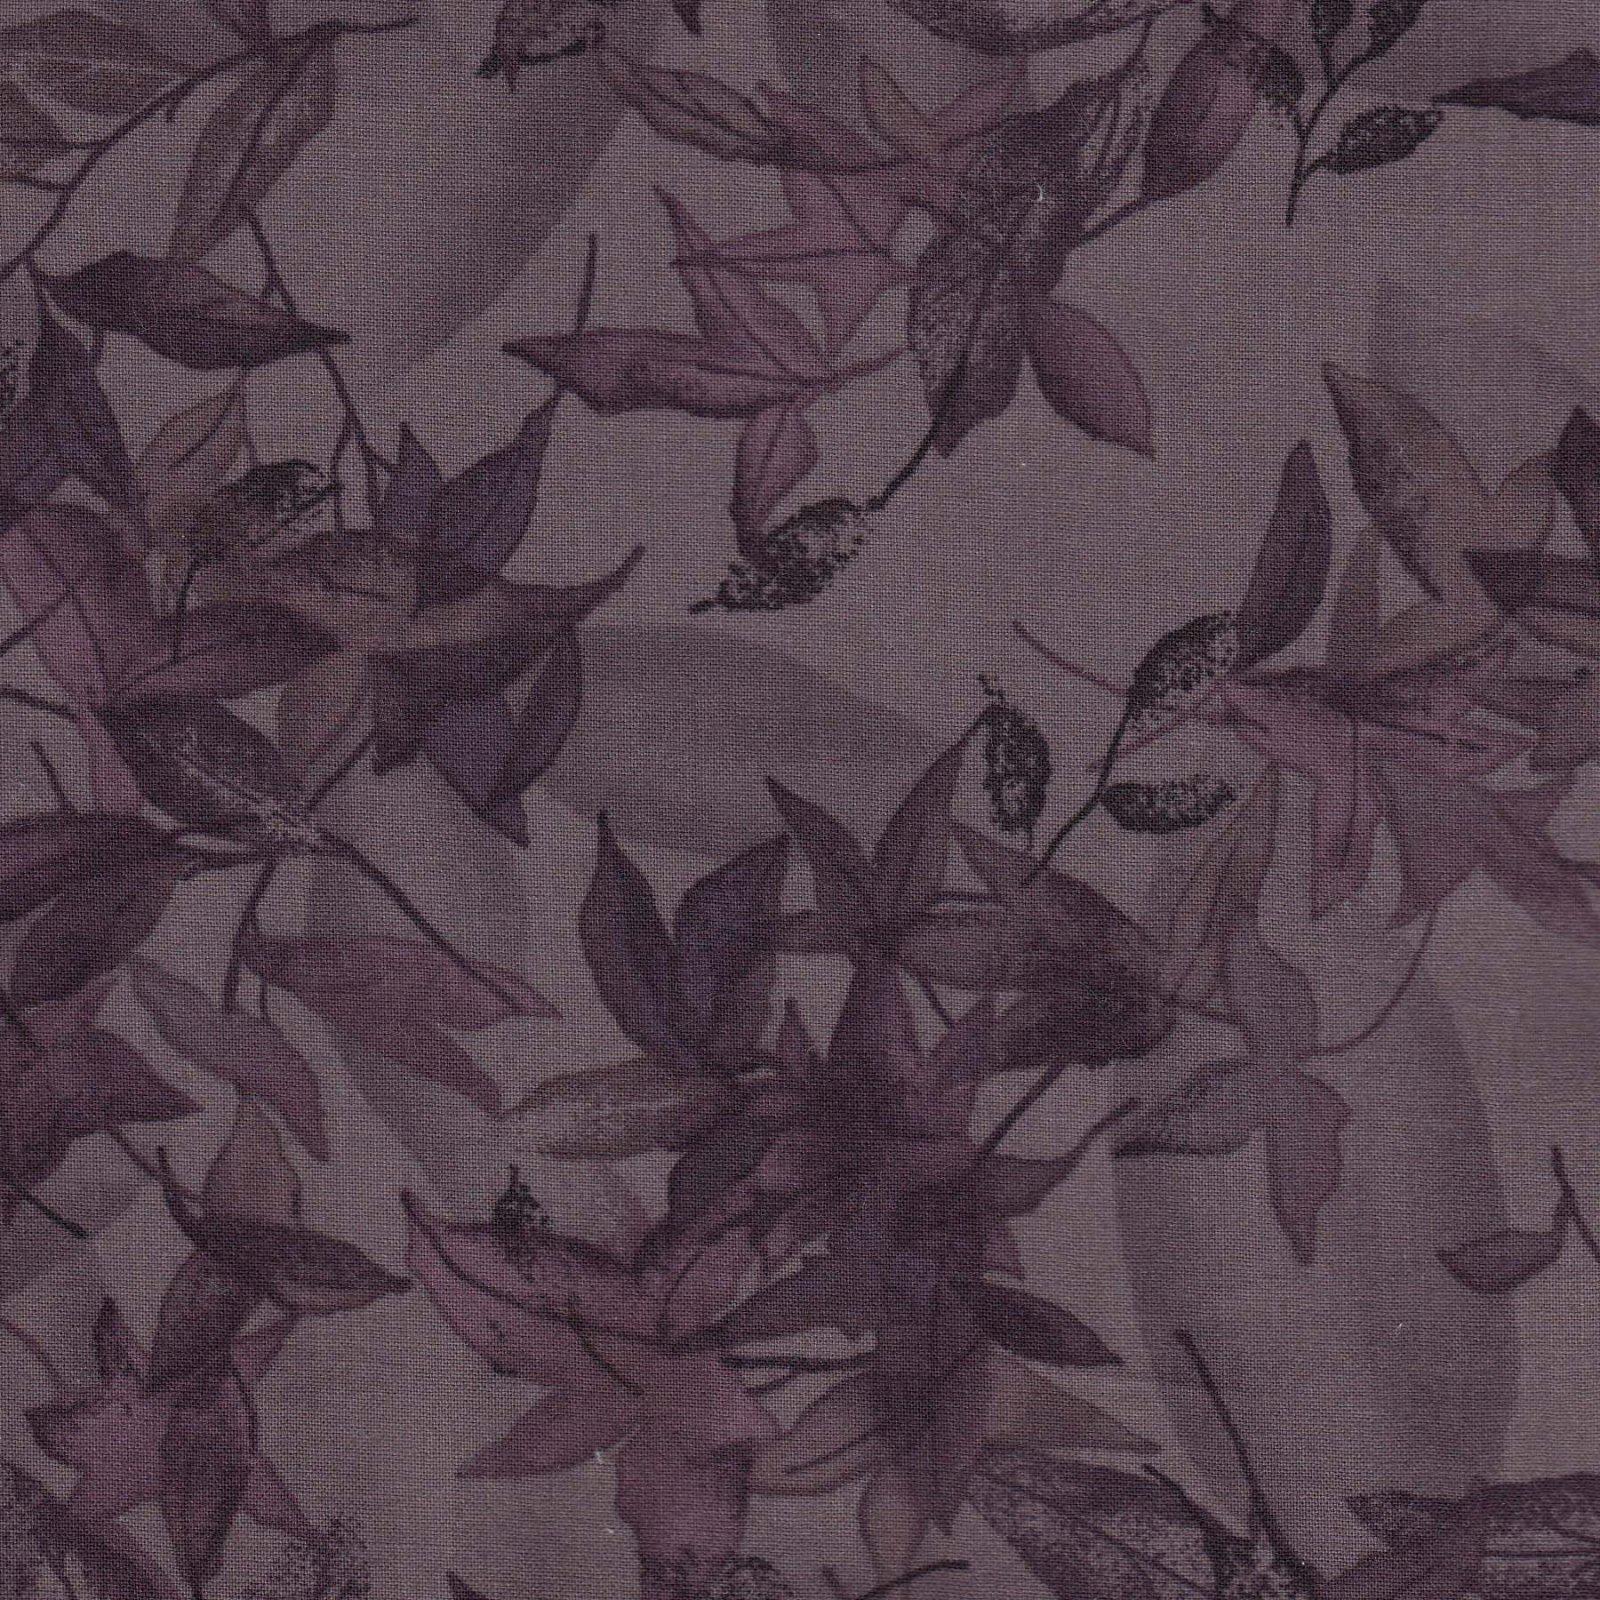 Remnant - 1 yard cut - Daiwabo Violet Floral